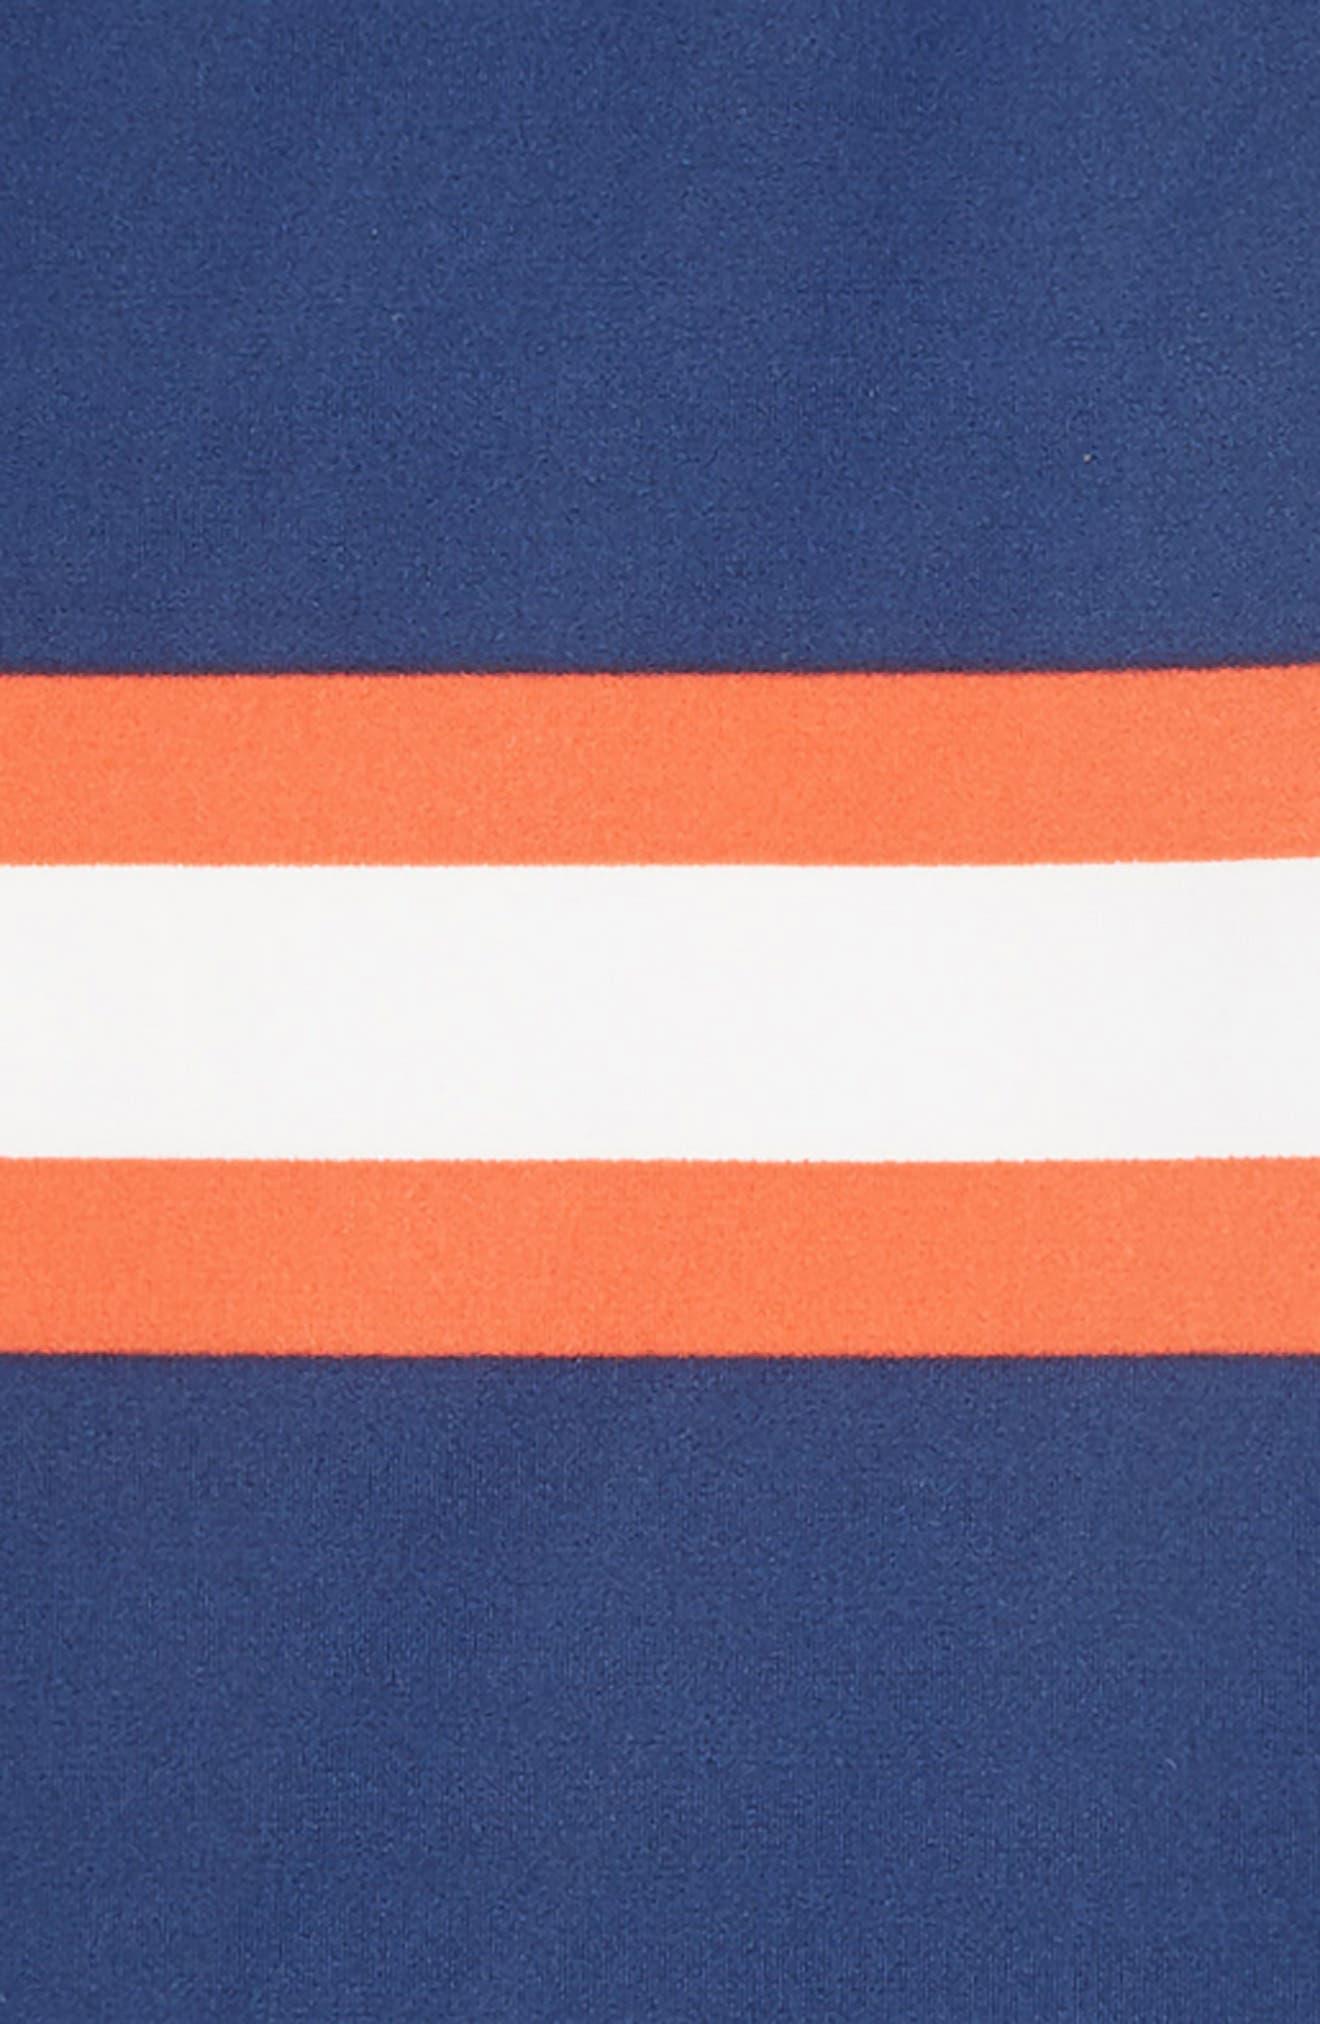 MINI BODEN,                             Chest Stripe Rashguard,                             Alternate thumbnail 2, color,                             COLLEGE BLUE